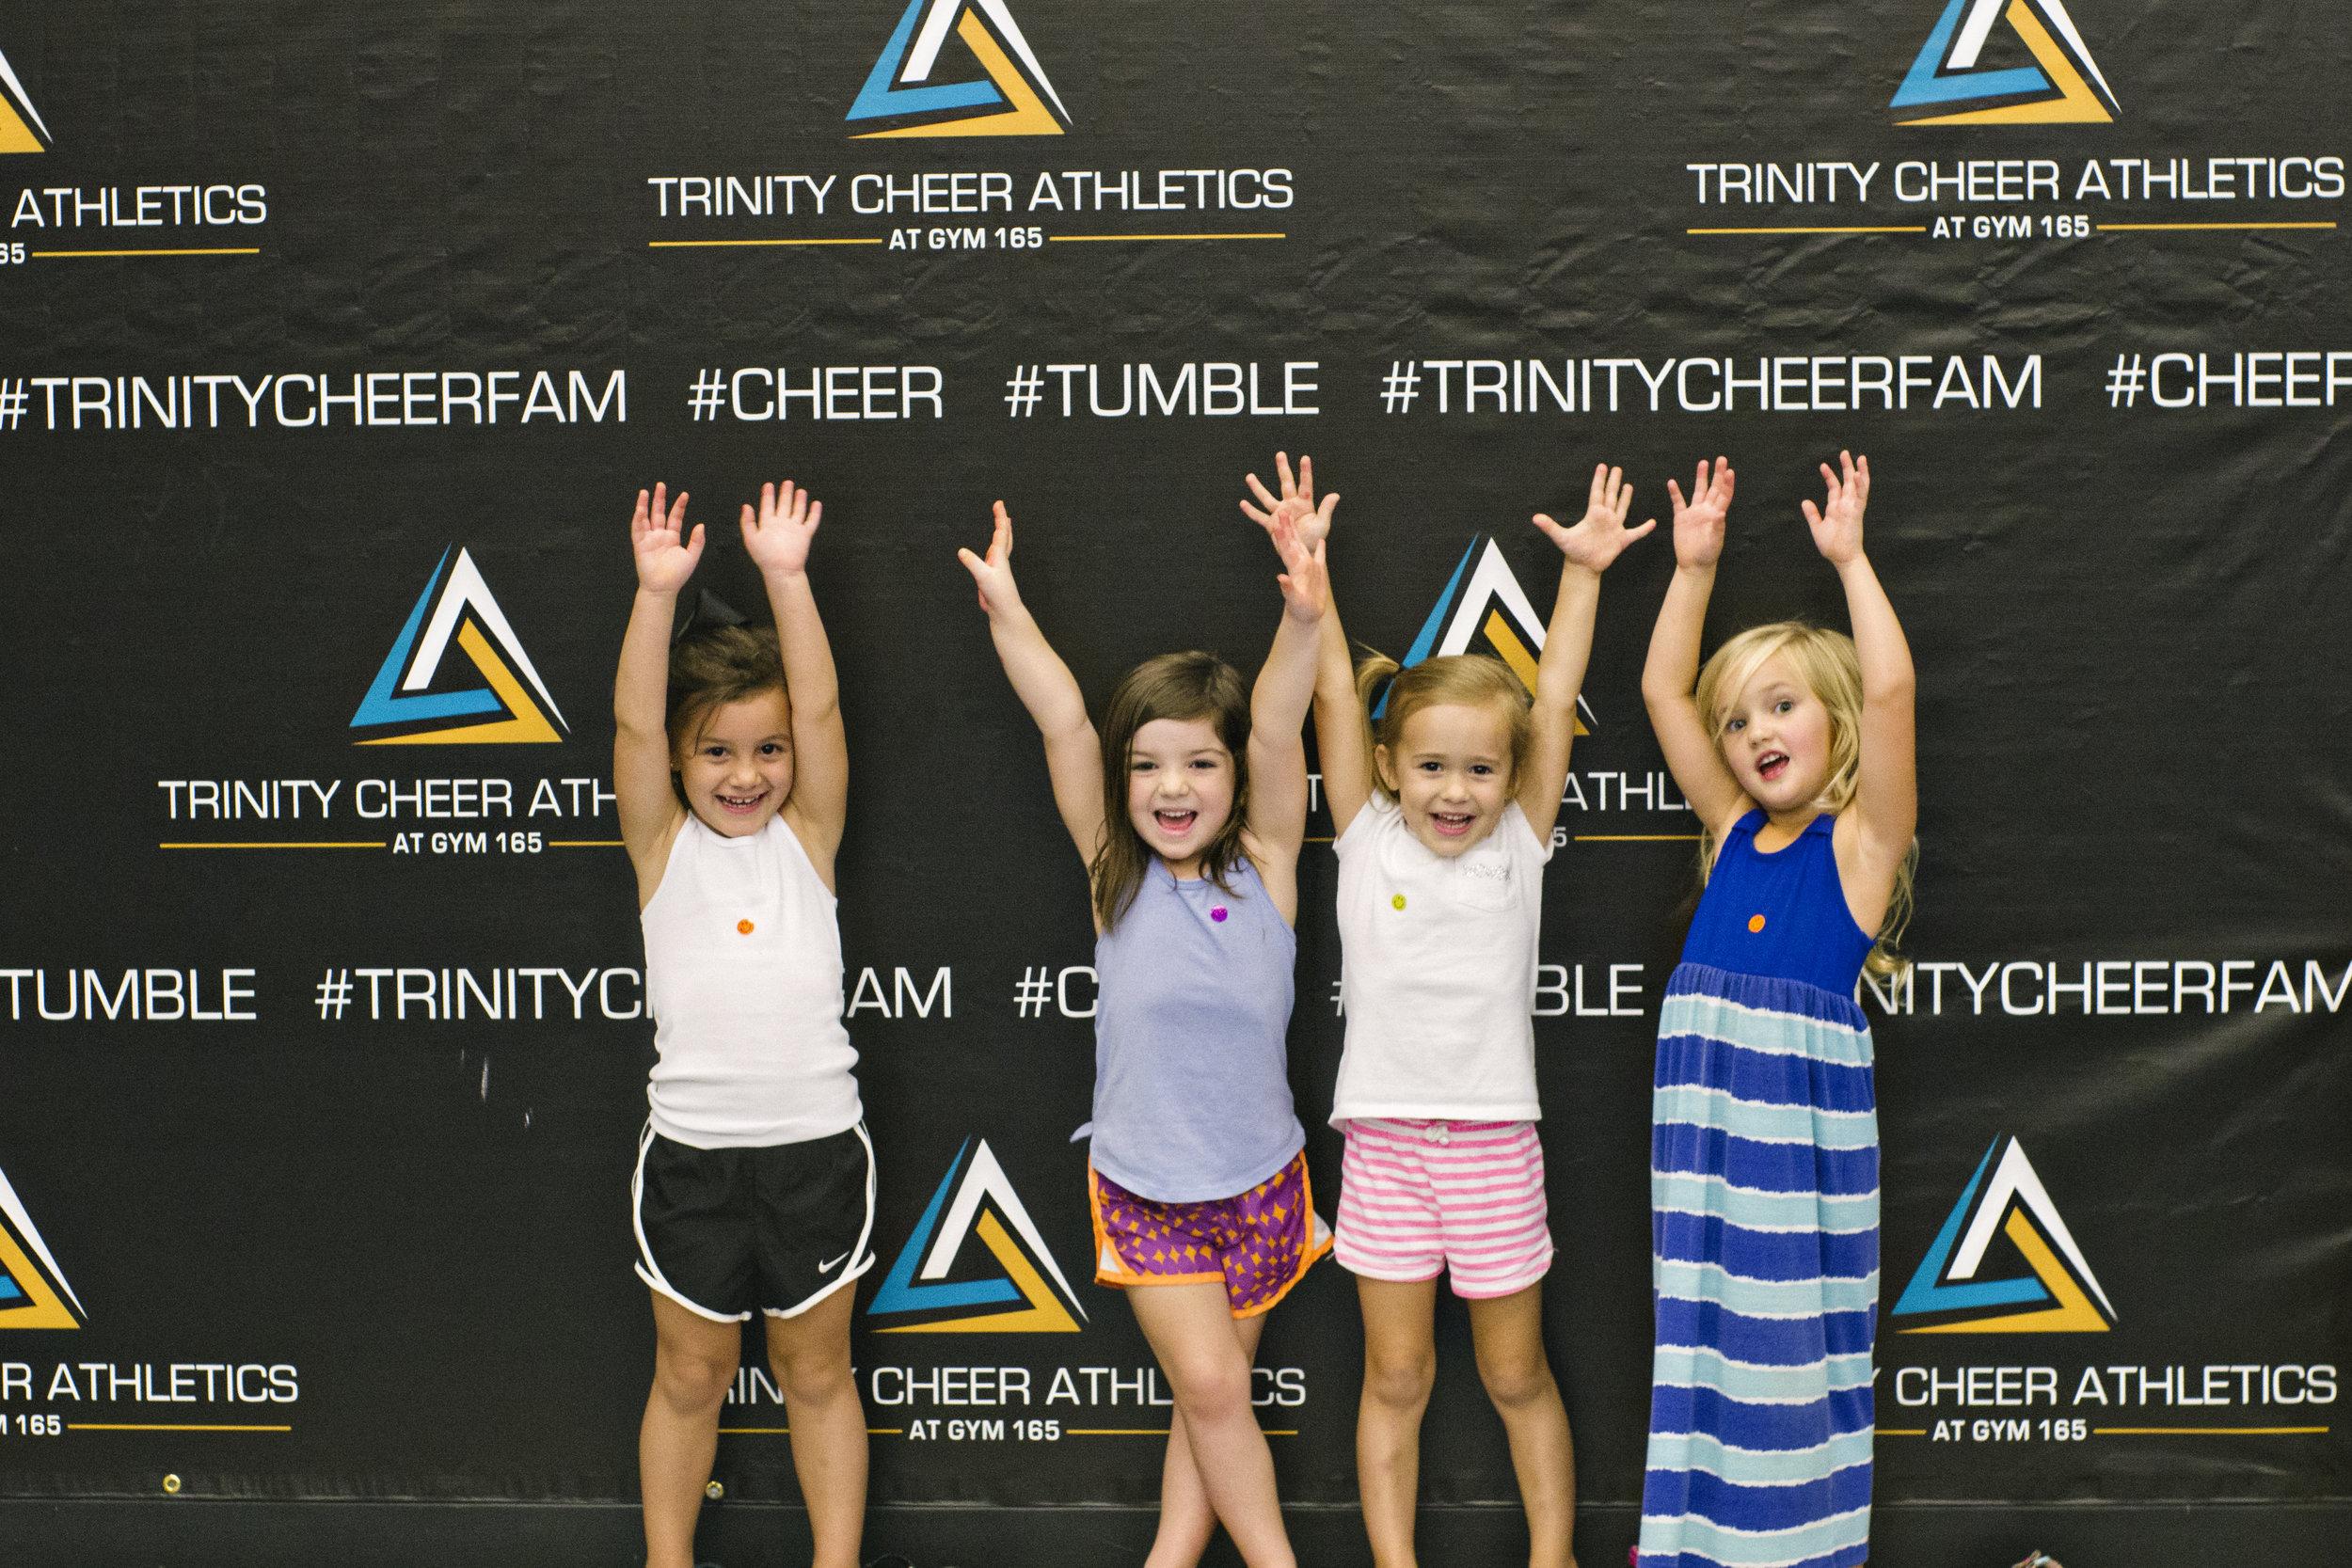 Trinity_Cheer_Athletics_Preschool_066.jpg